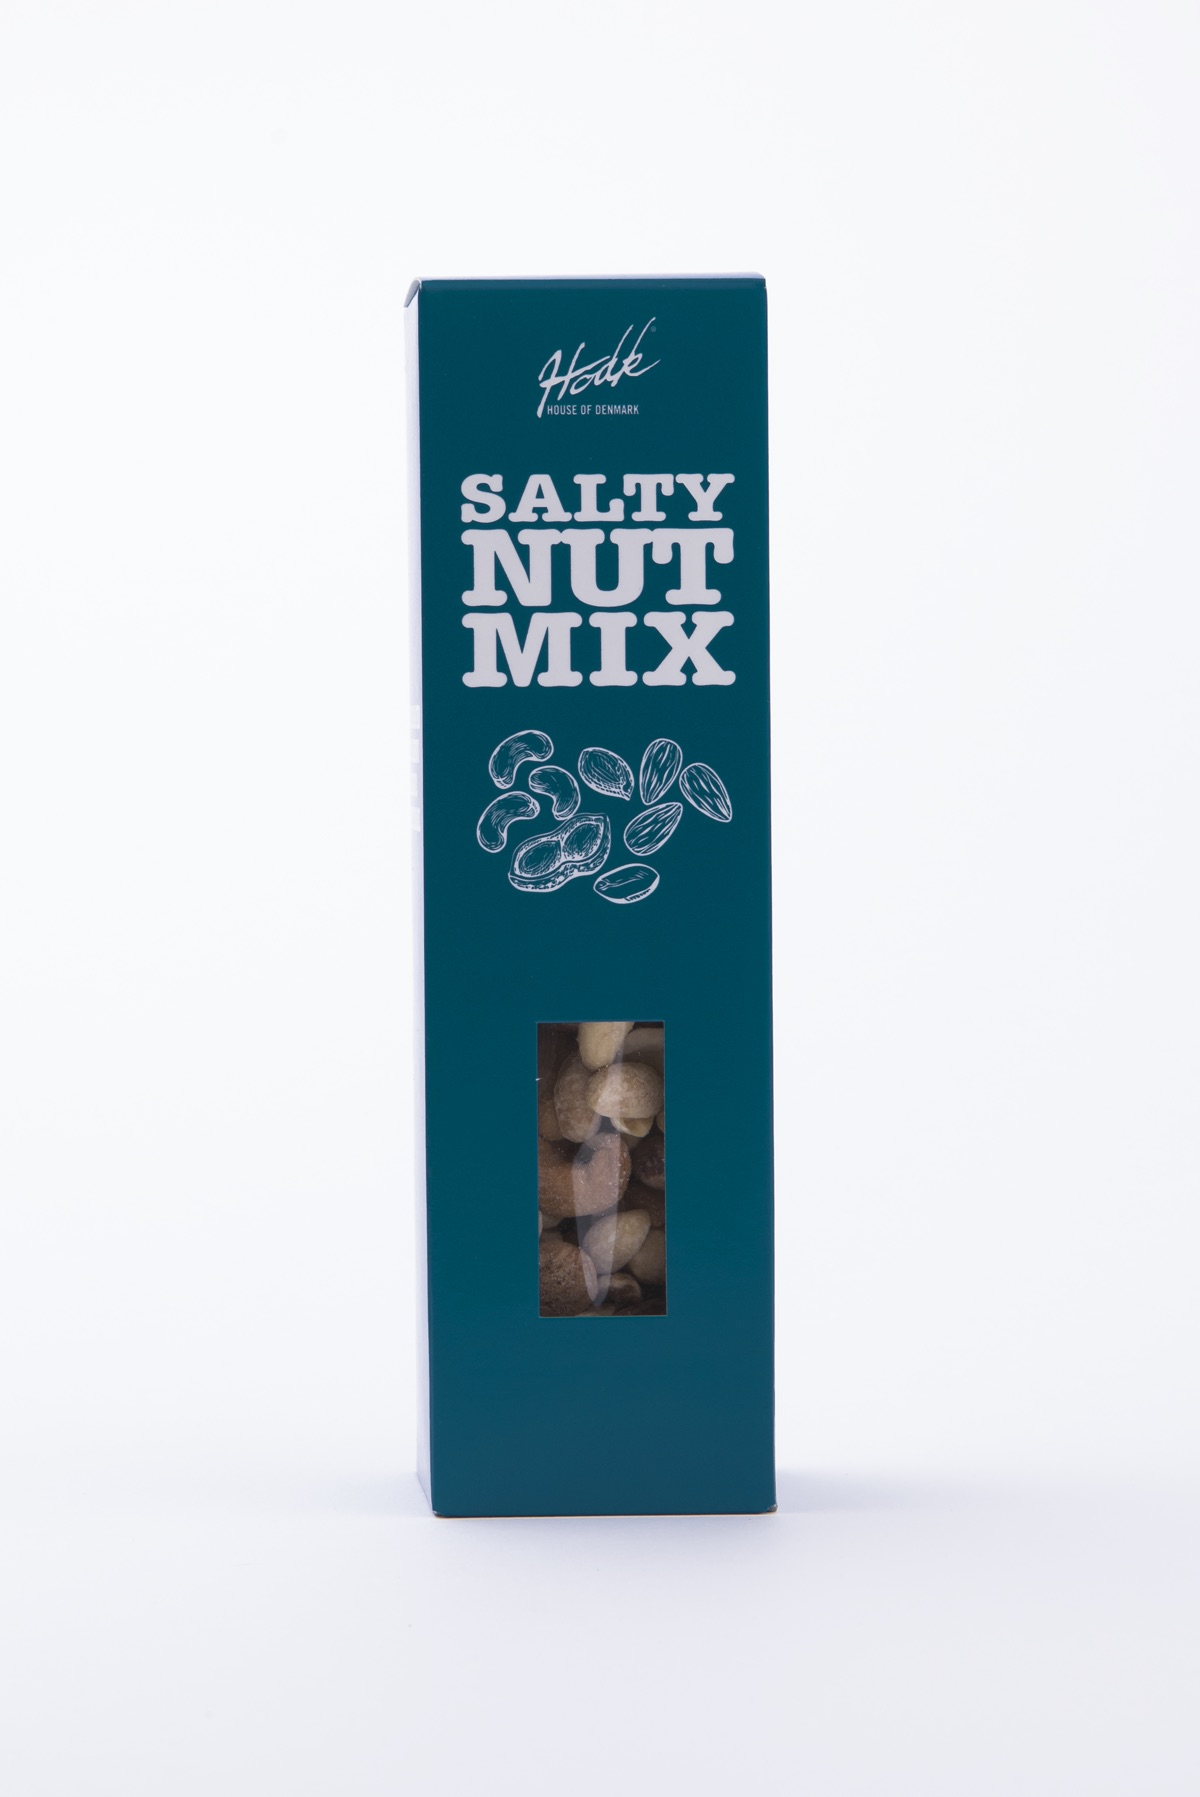 Salty Nut Mix